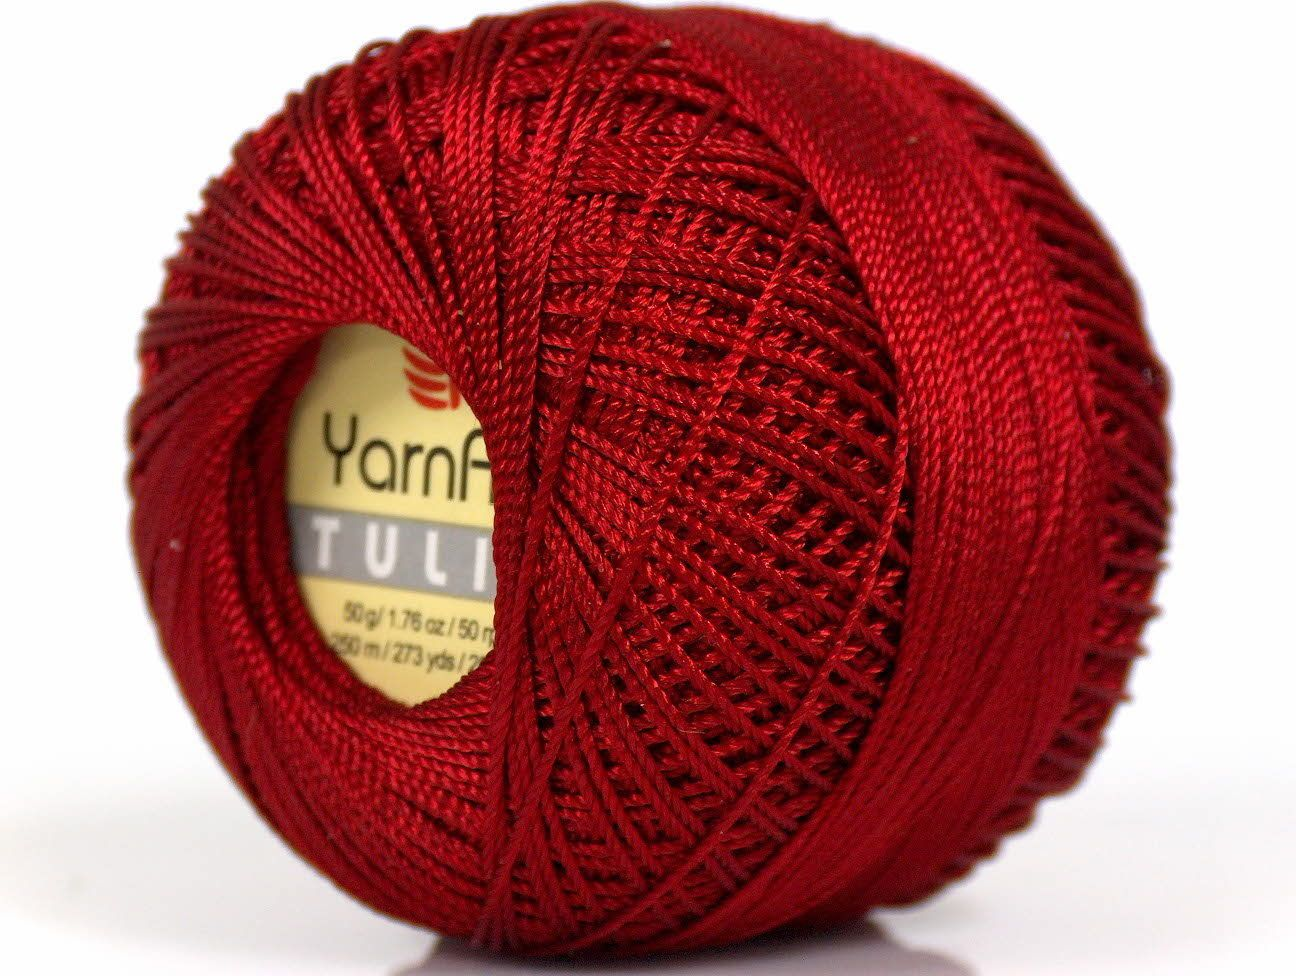 100/% MicroFiber Hand Knitting Yarn Blue Lot of 6 Skeins YarnArt TULIP